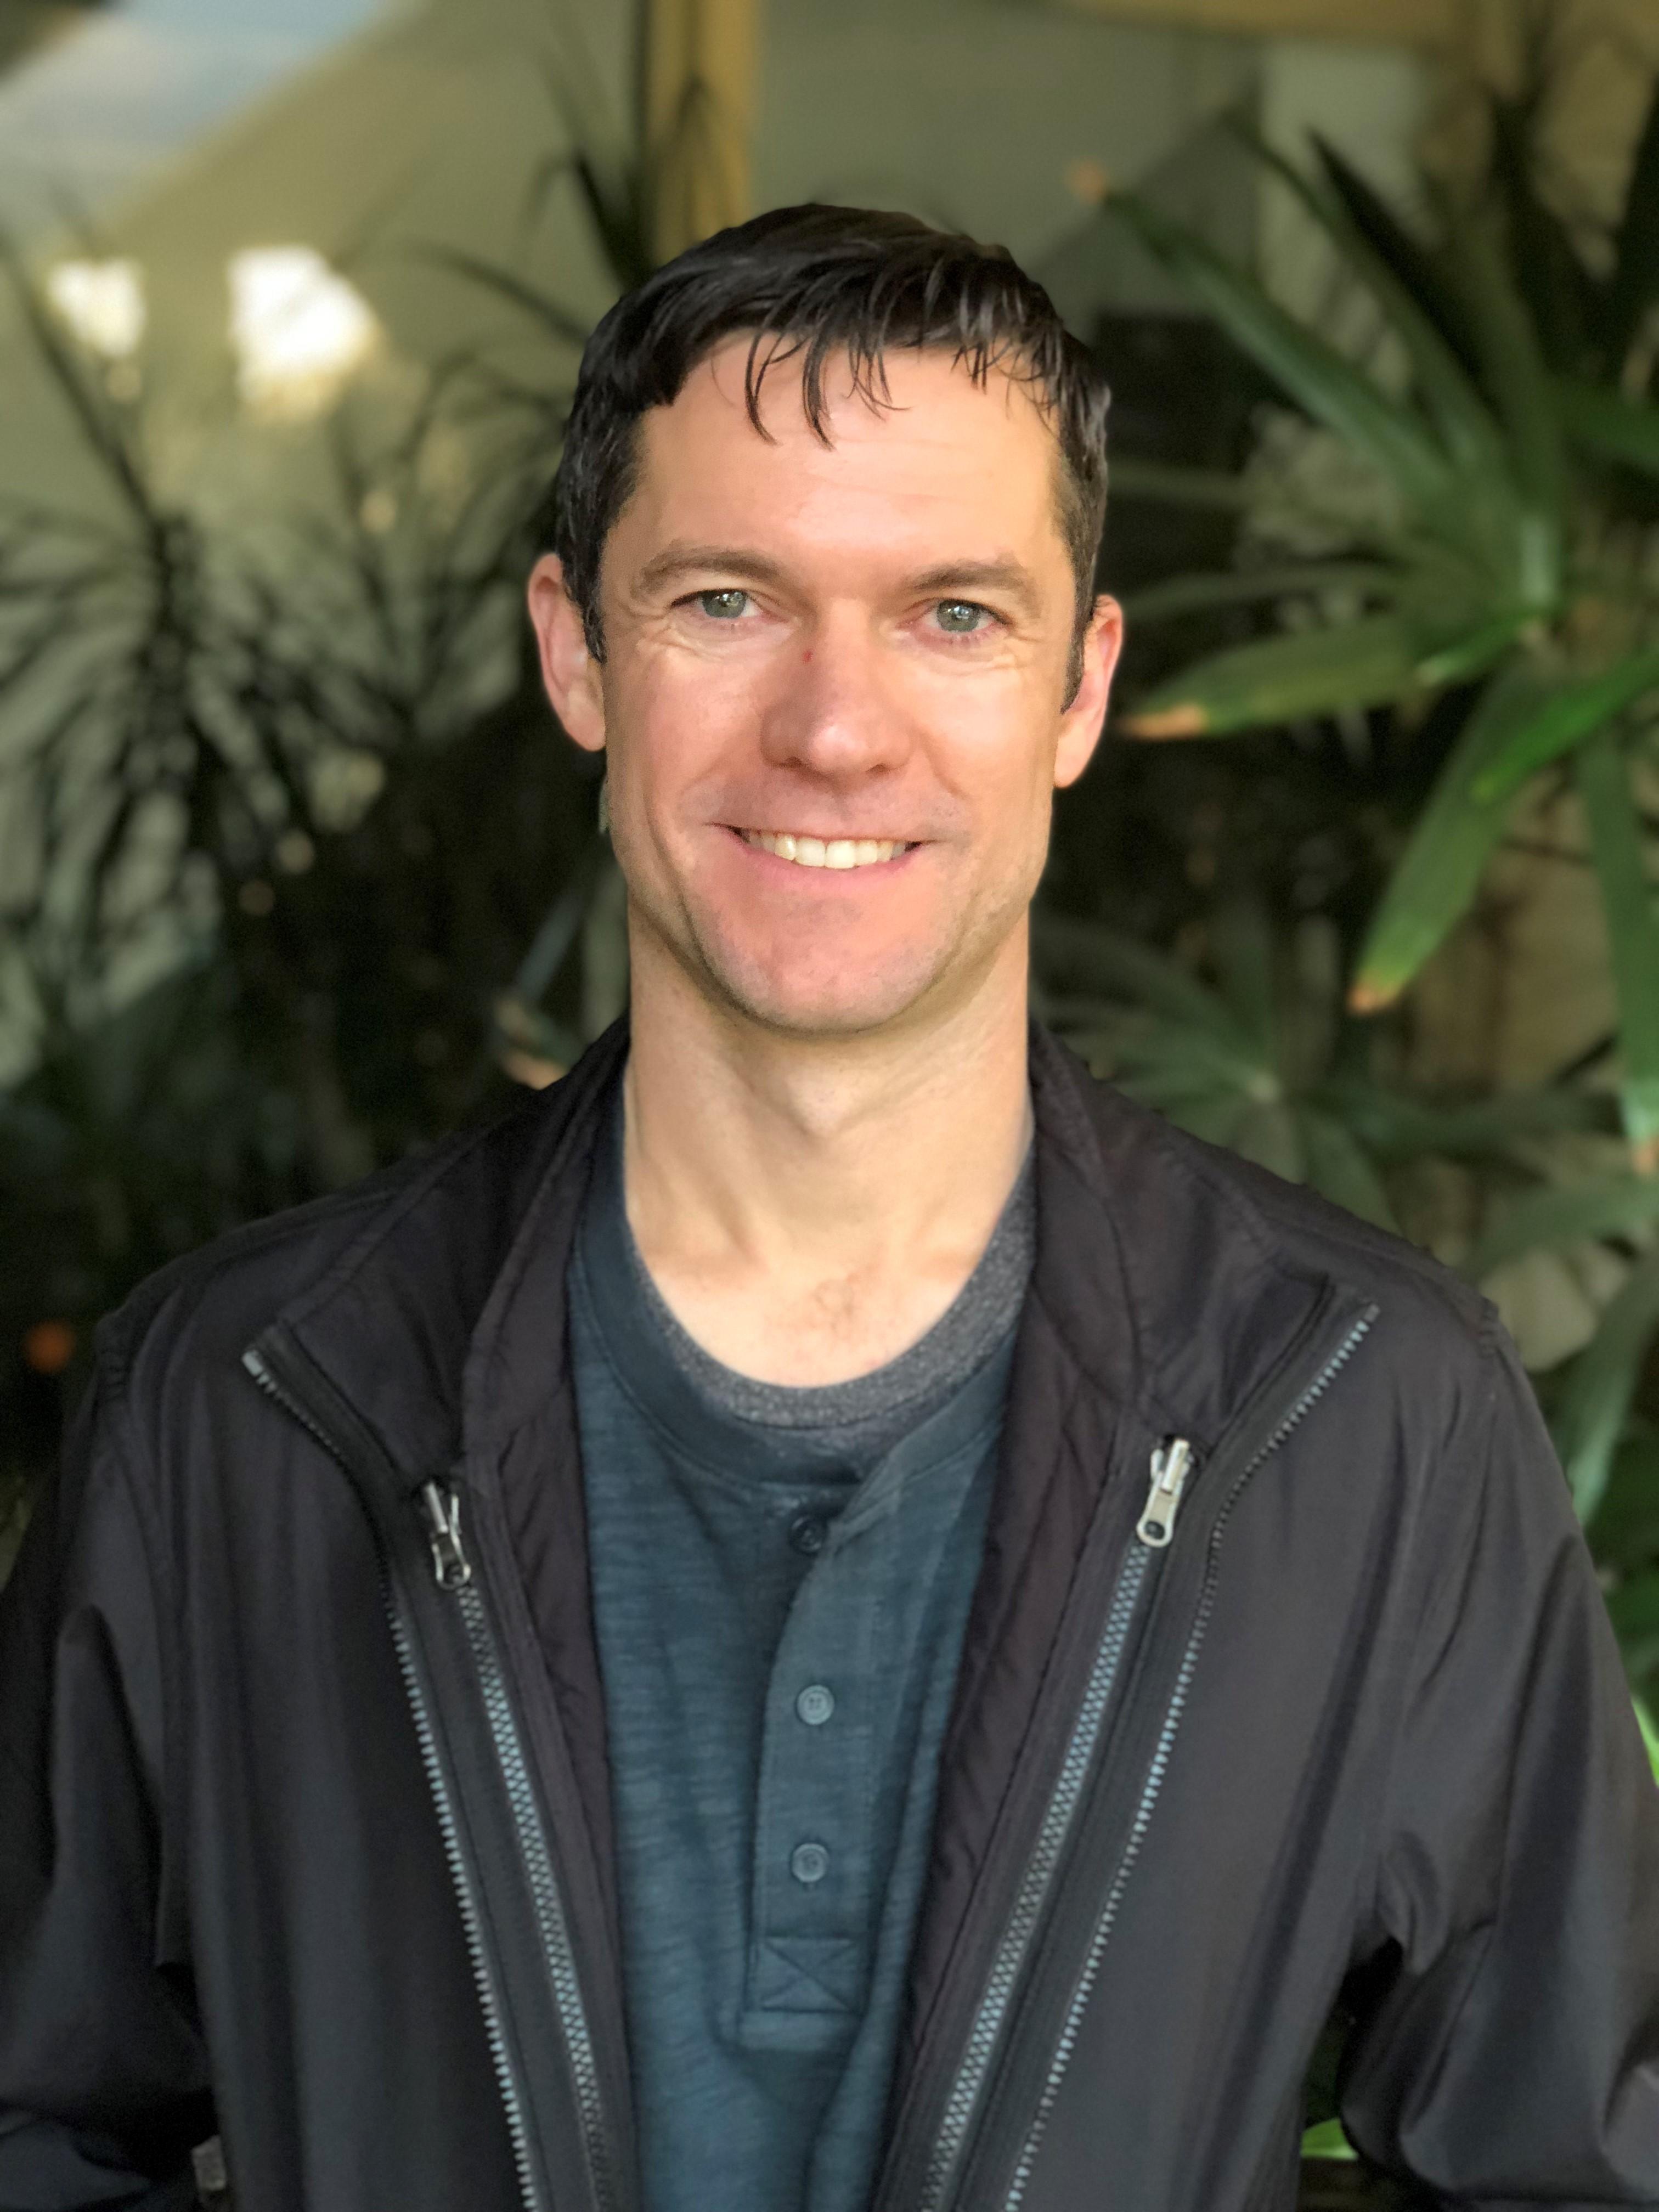 Atlas Music Publishing Taps Industry Vet Mike Locke To Head Sync Department